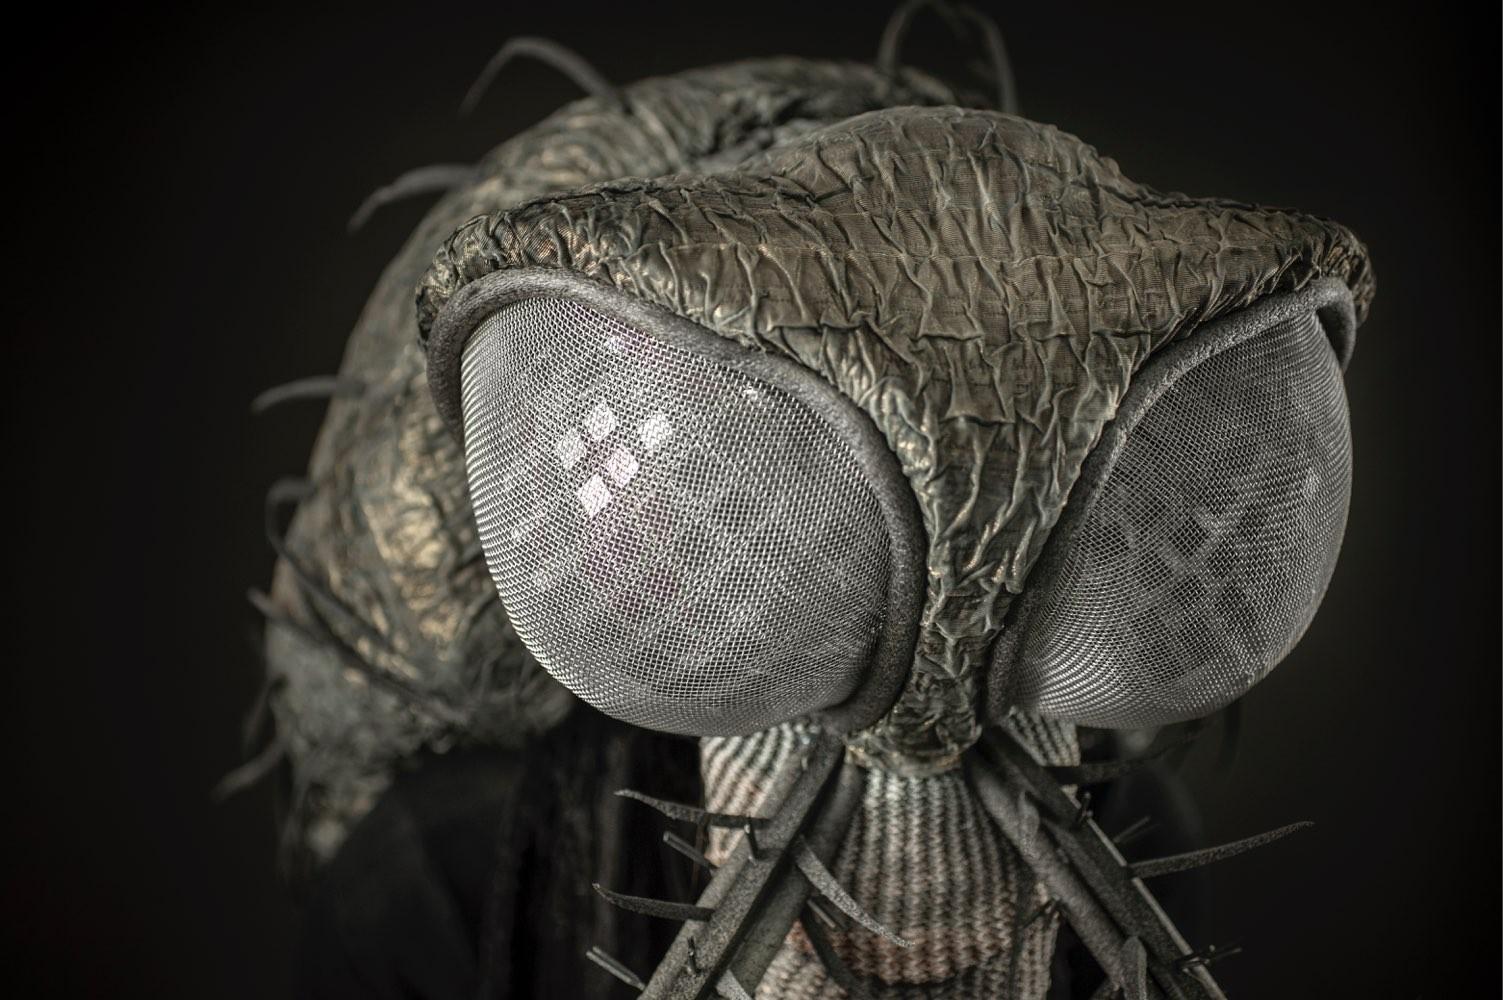 Mosquito close-up